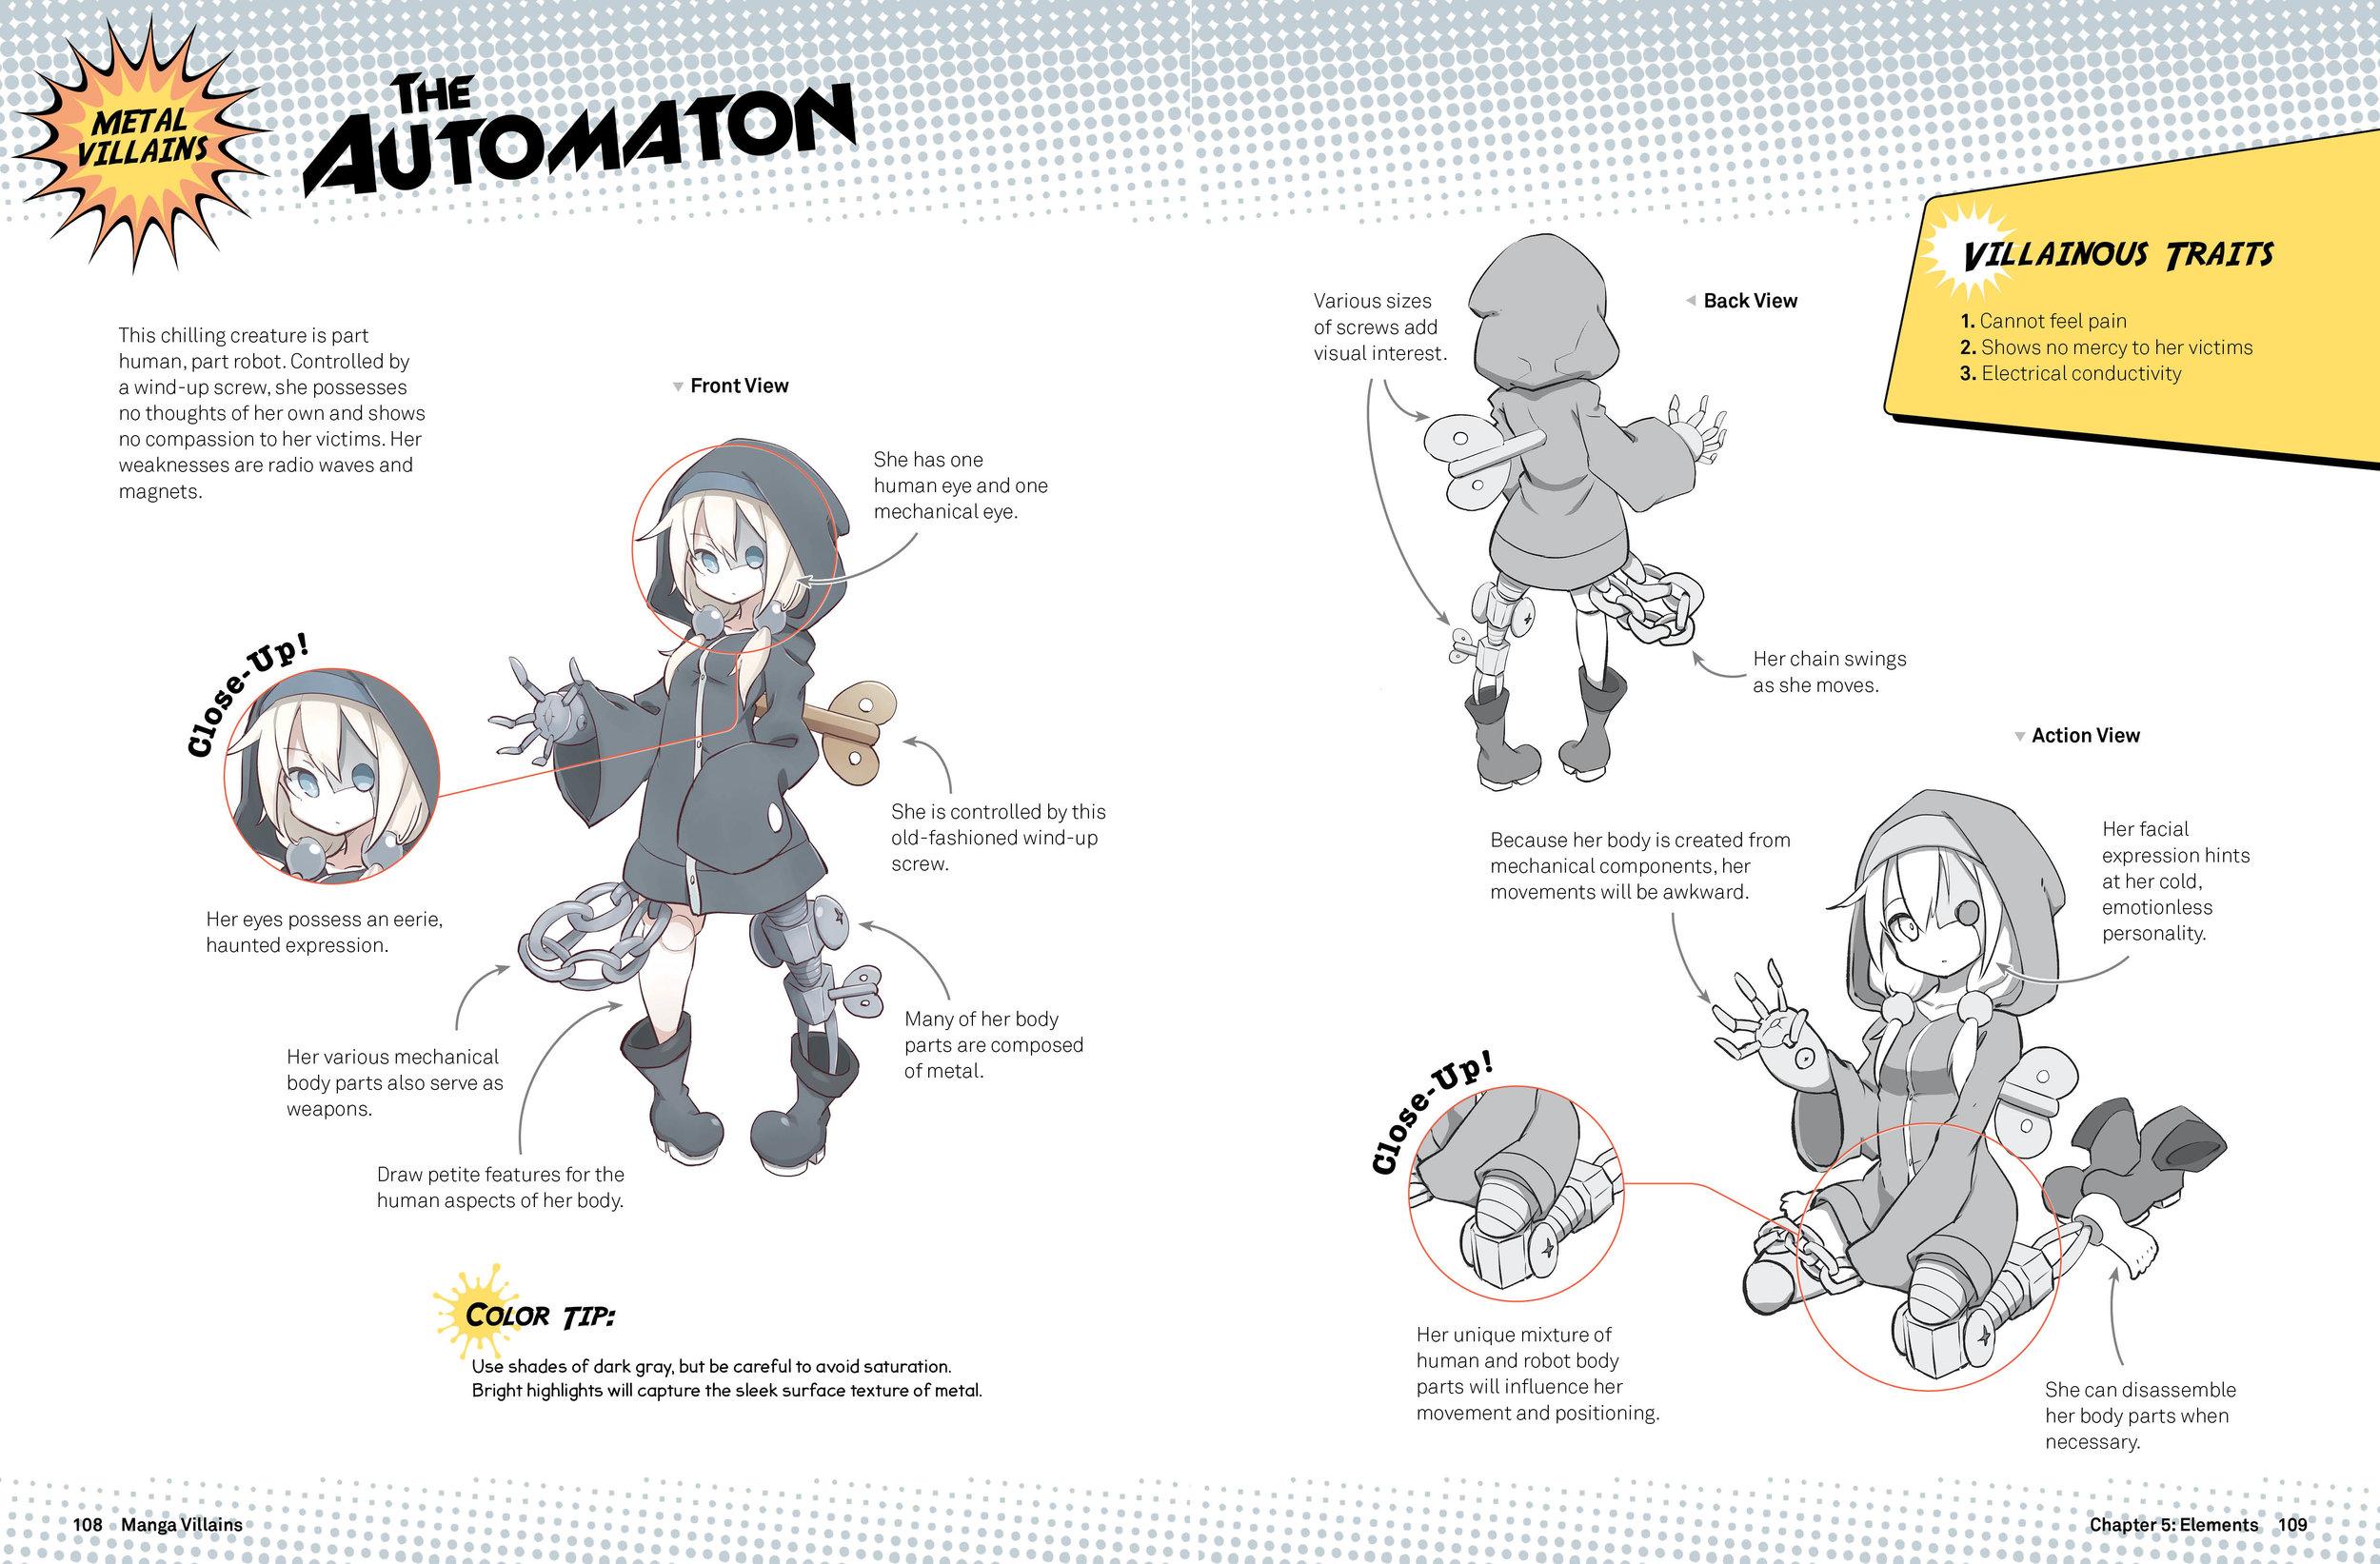 Draw Manga Villains 108.109.jpg